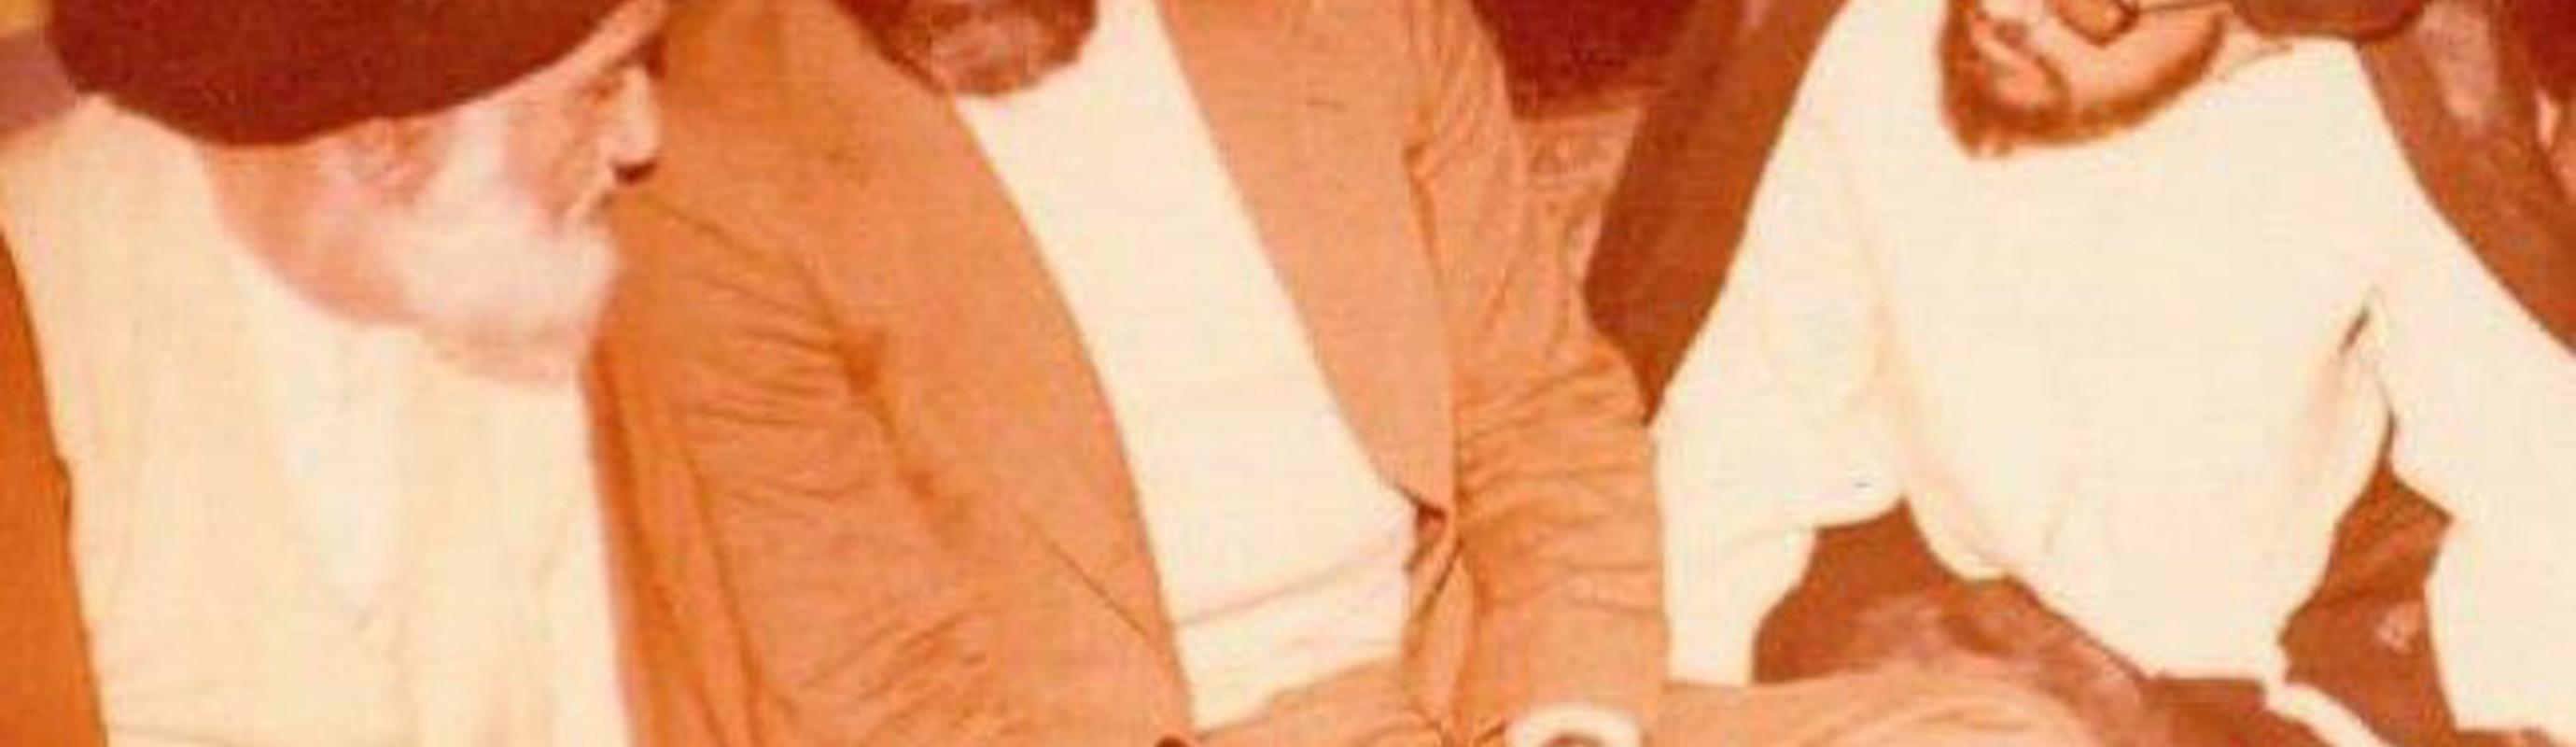 In memory of Seyed Morteza Salehi Khansari.